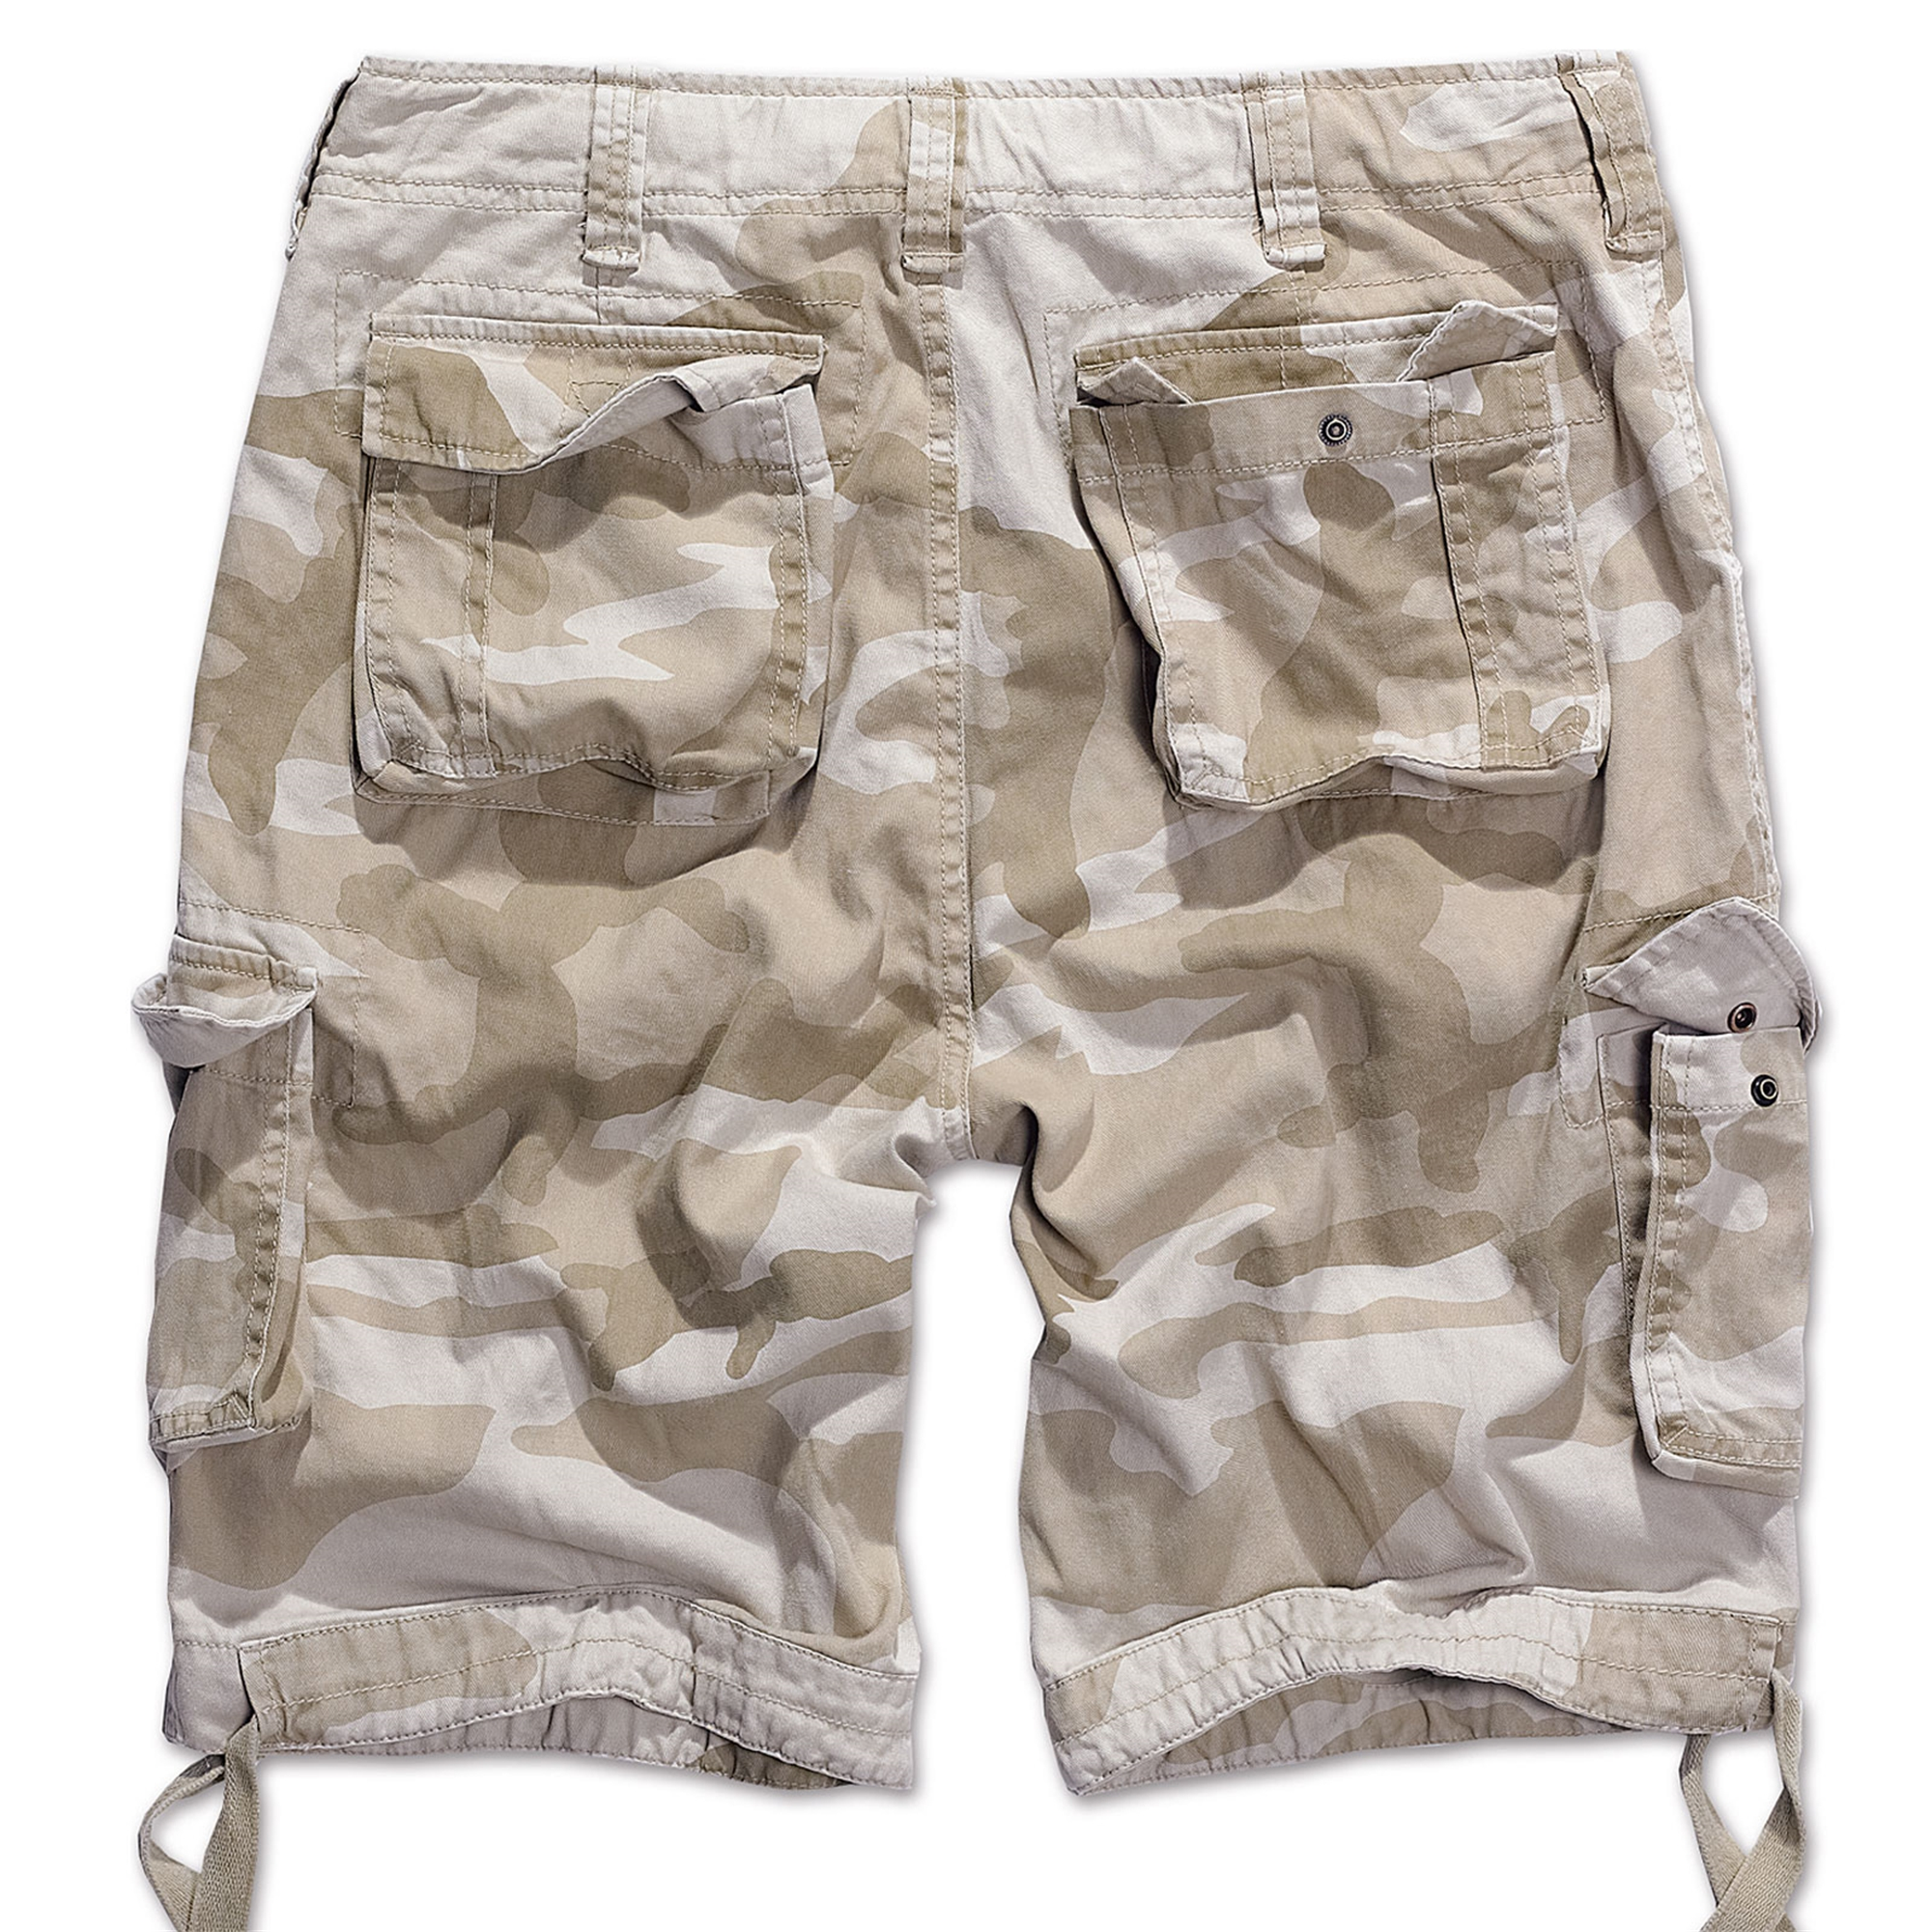 Brandit-Urban-Legend-Herren-Cargo-Shorts-Bermuda-Kurze-Hose-Short-US-Army Indexbild 20